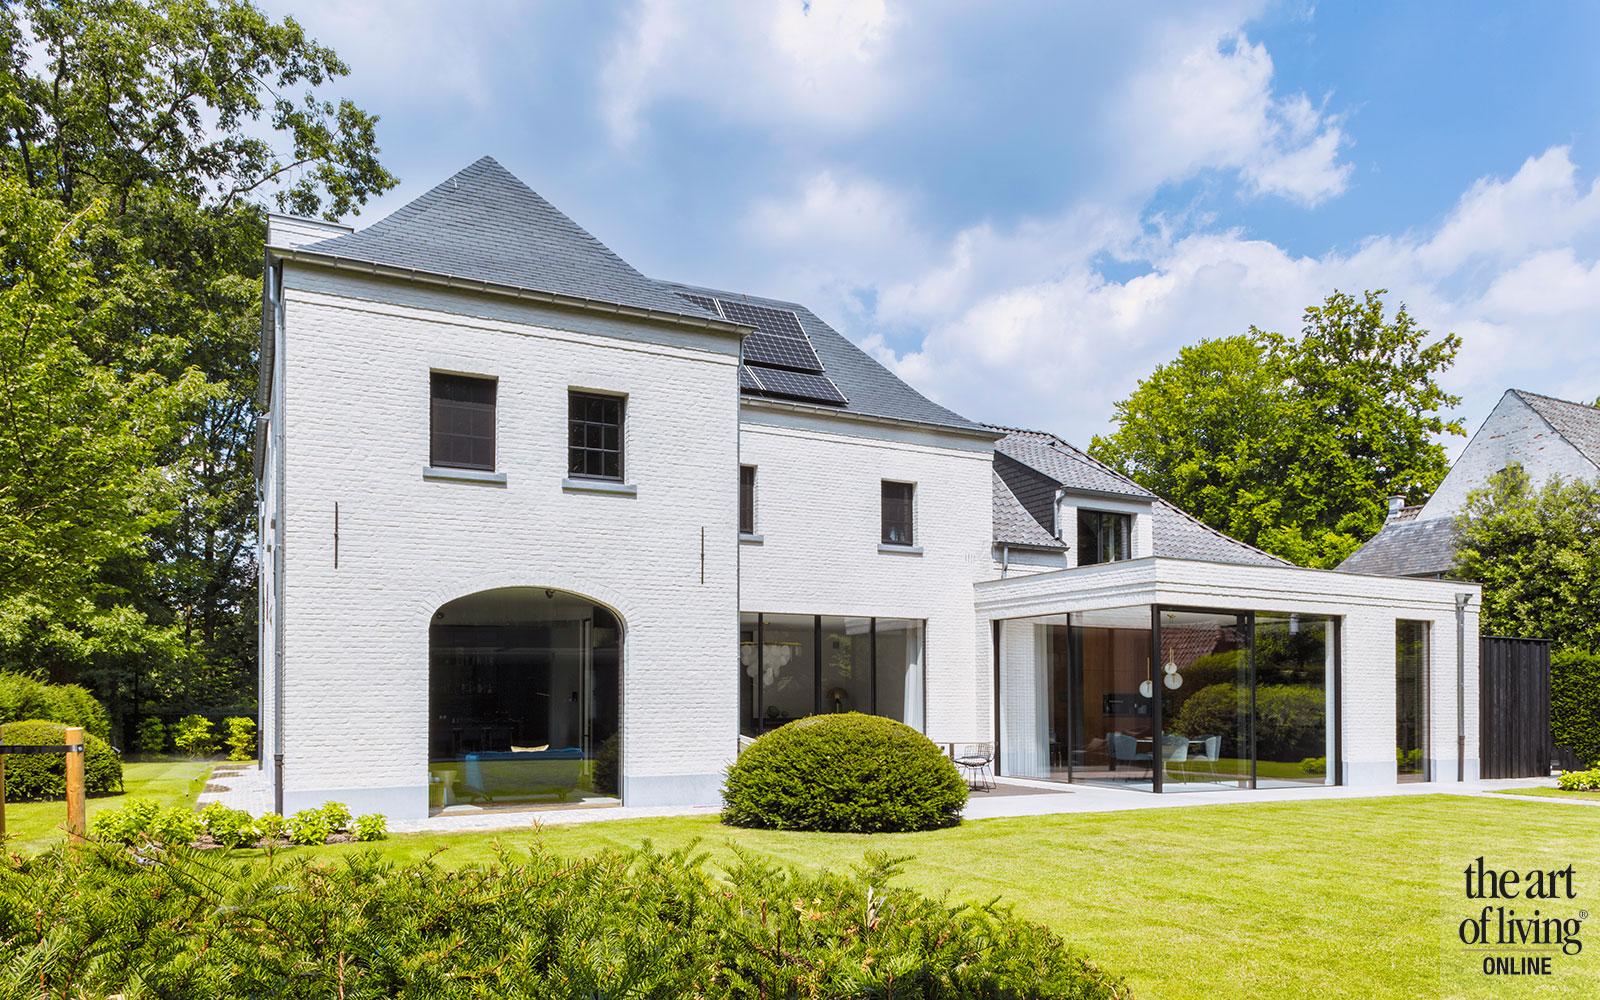 Kempische villa, Mieke van Herck, architectuur